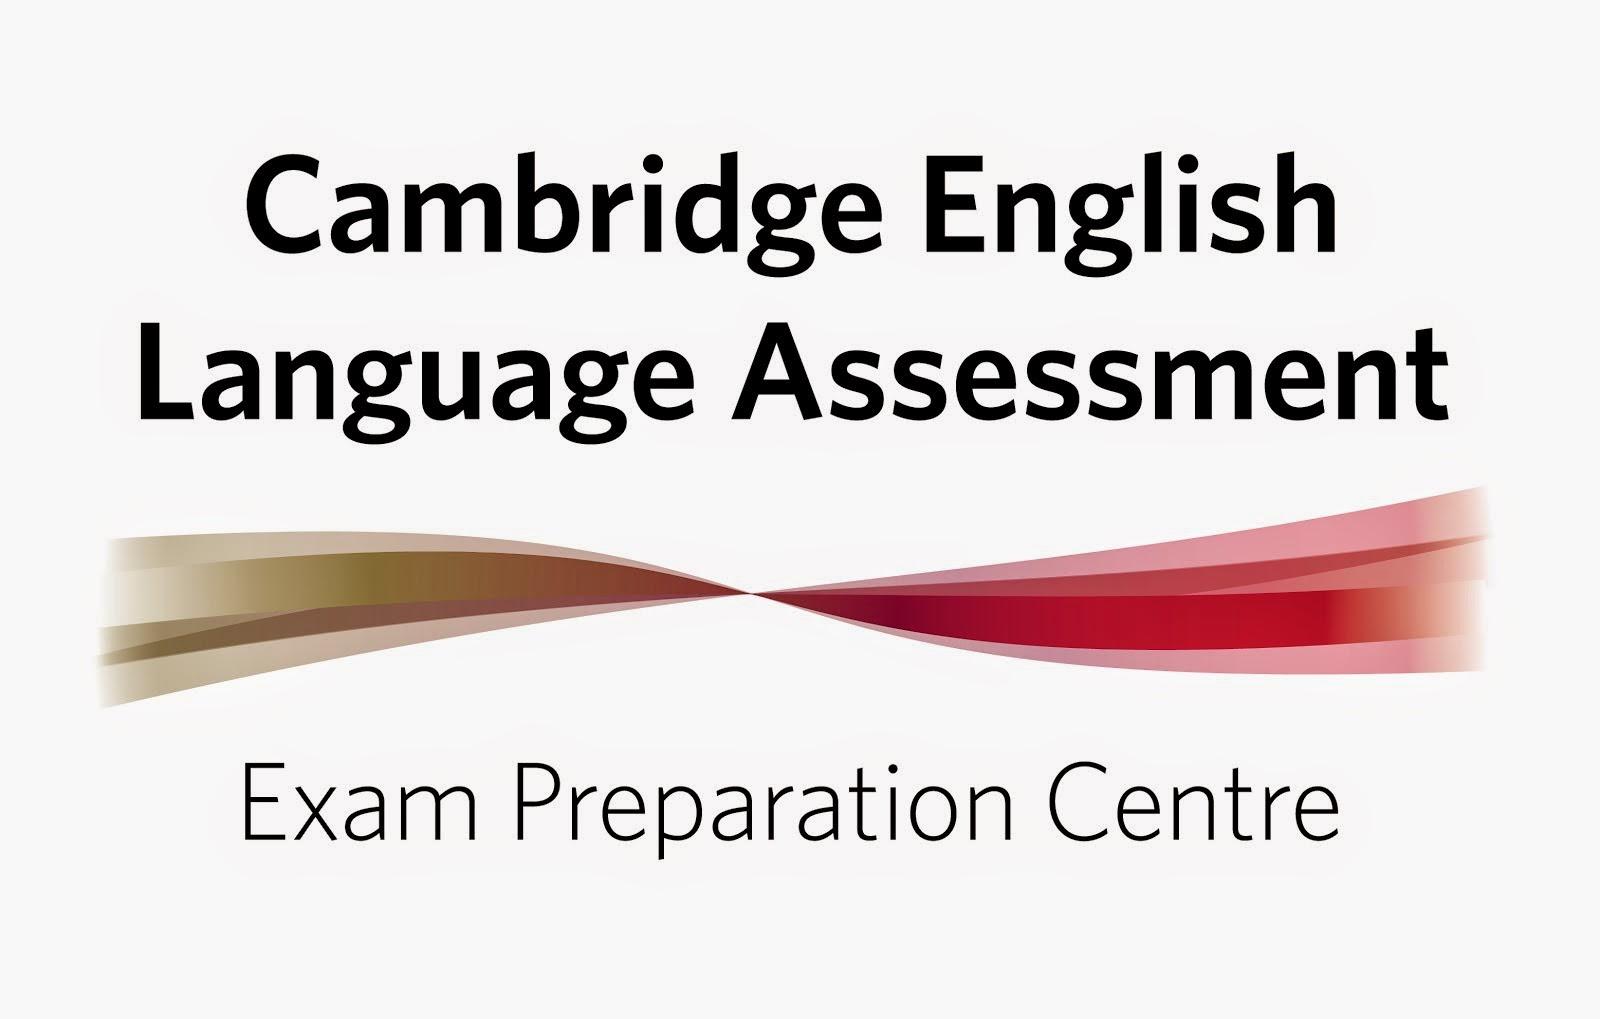 Cambridge Exams for Children